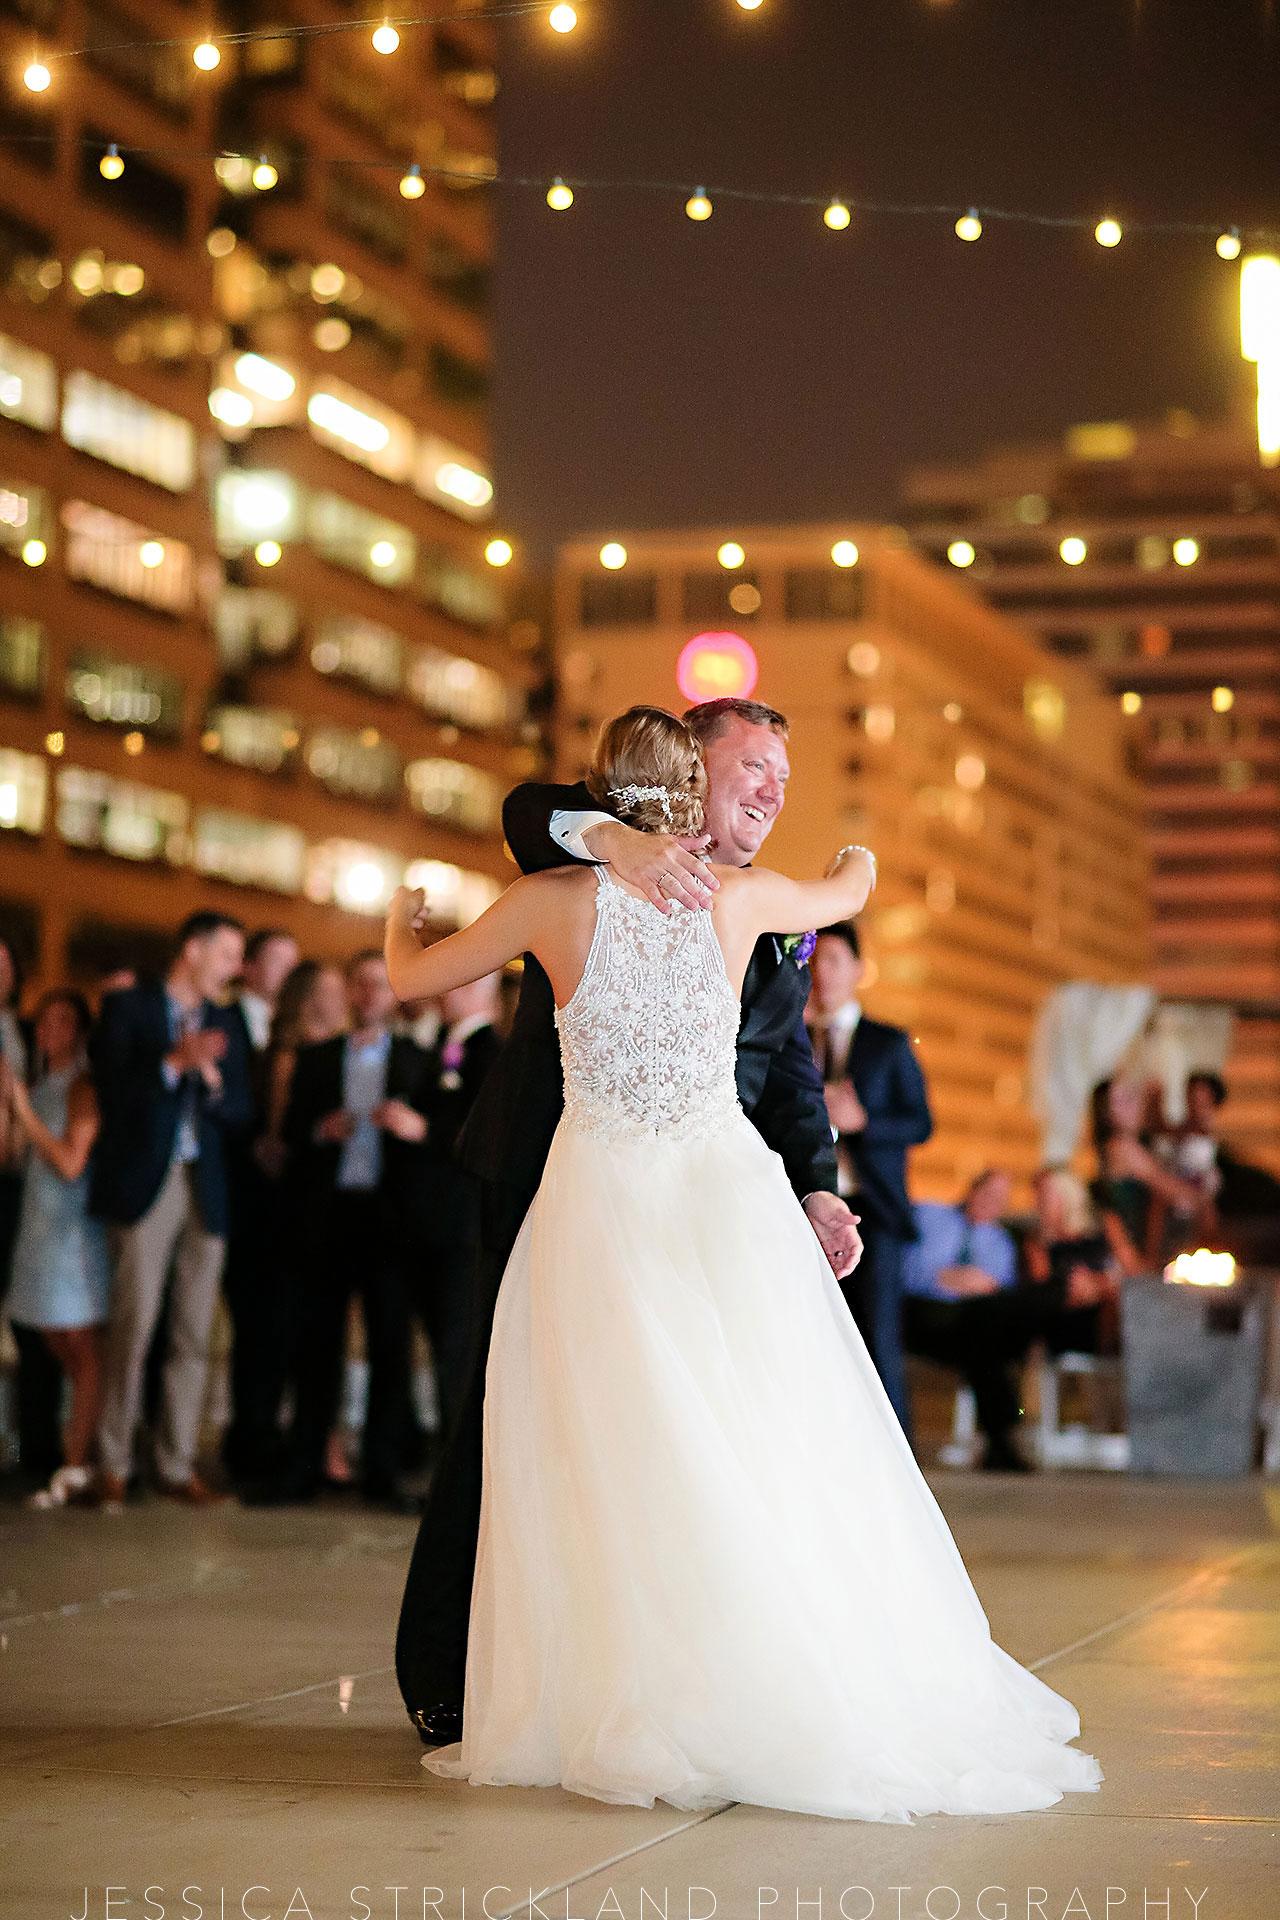 Serra Alex Regions Tower Indianapolis Wedding 364 watermarked